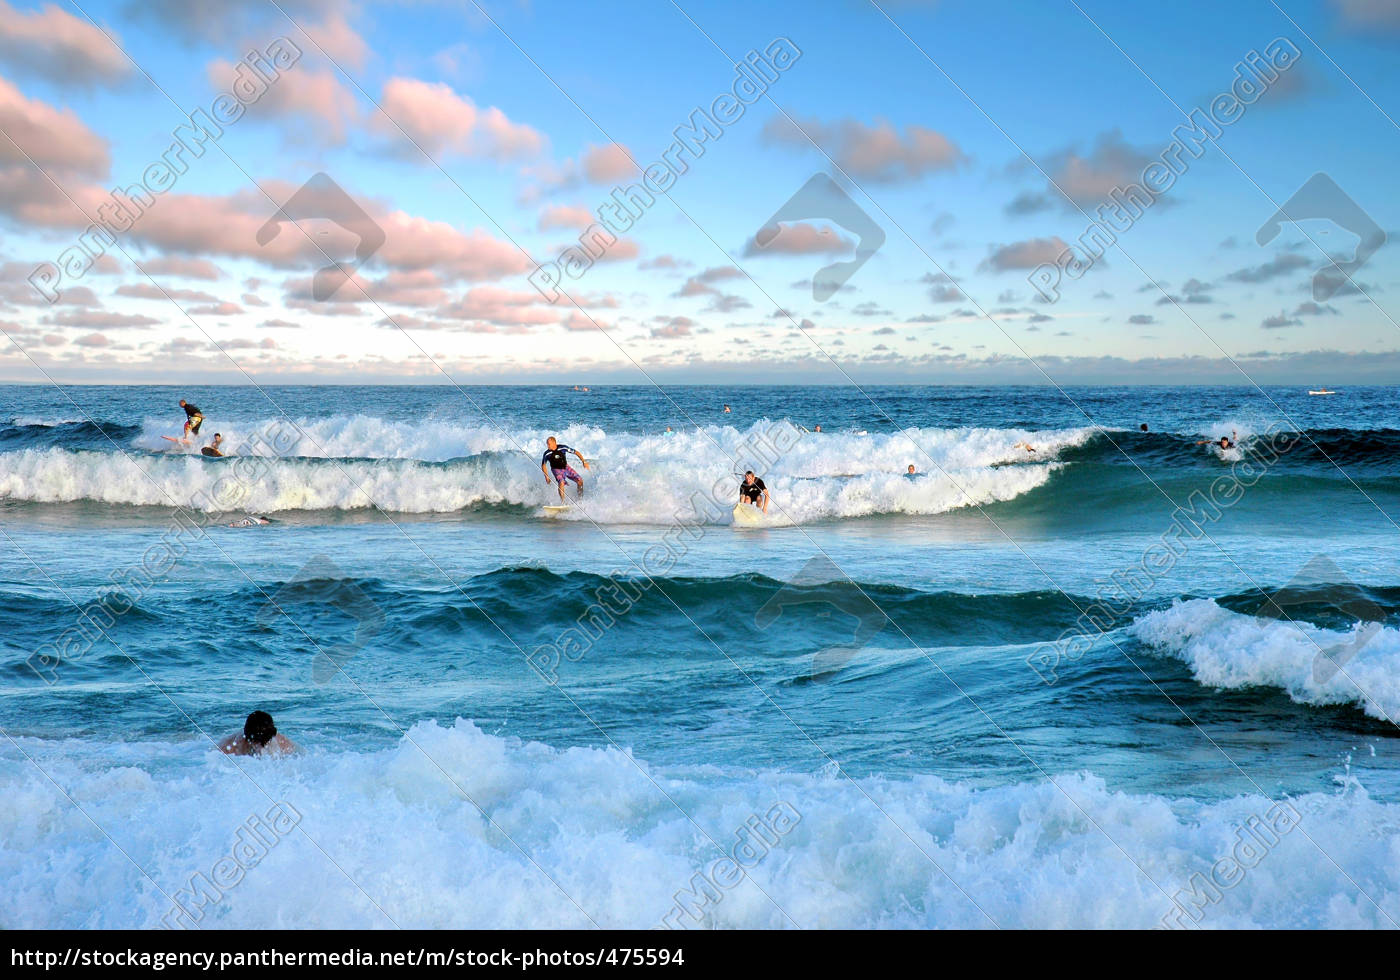 surf, fun, at, bondi, beach, in - 475594